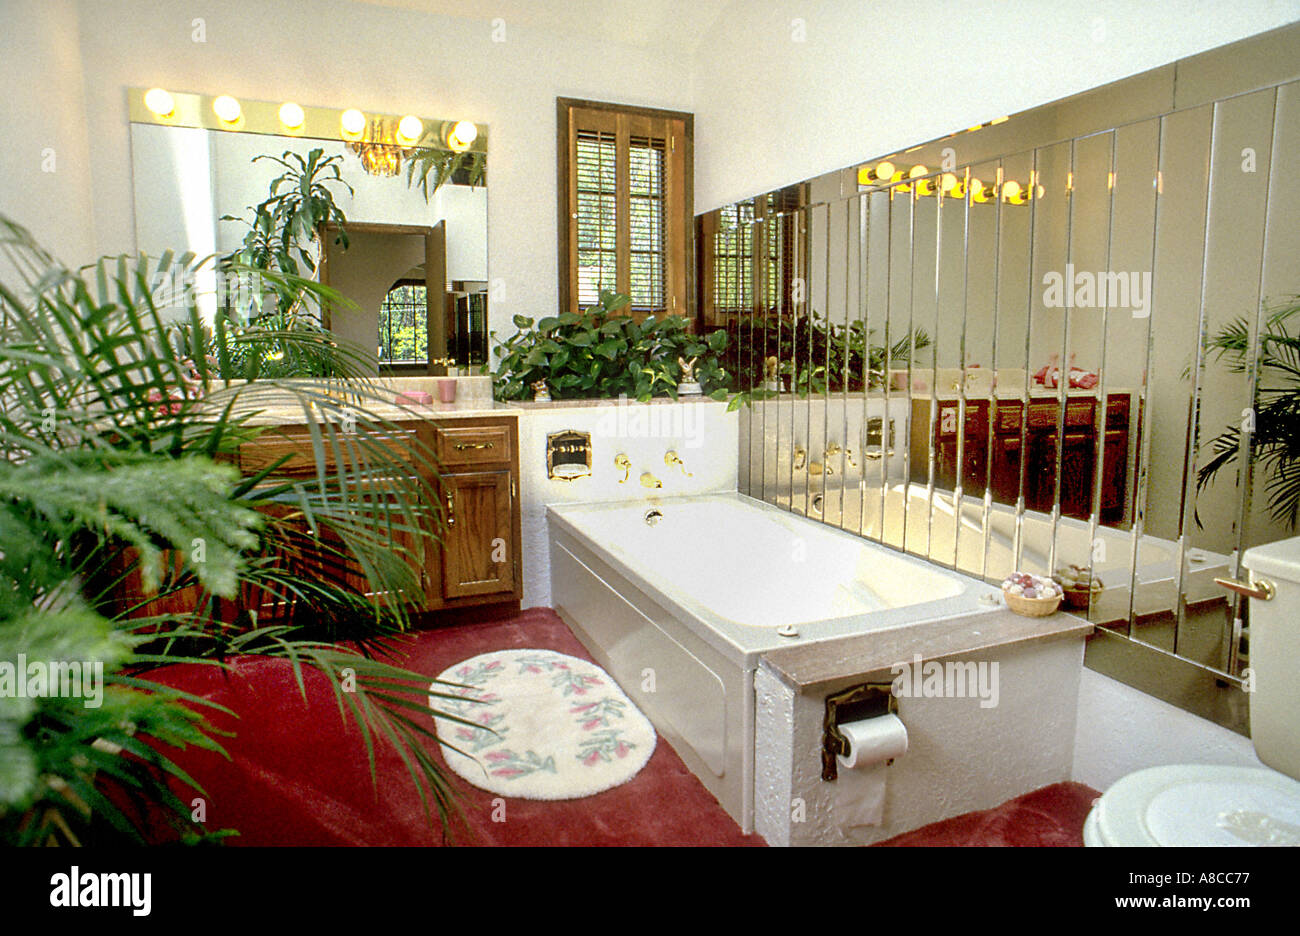 American Bathrooms USA Whirlpool Tub In House Interior Custom Luxury Bathroom Home